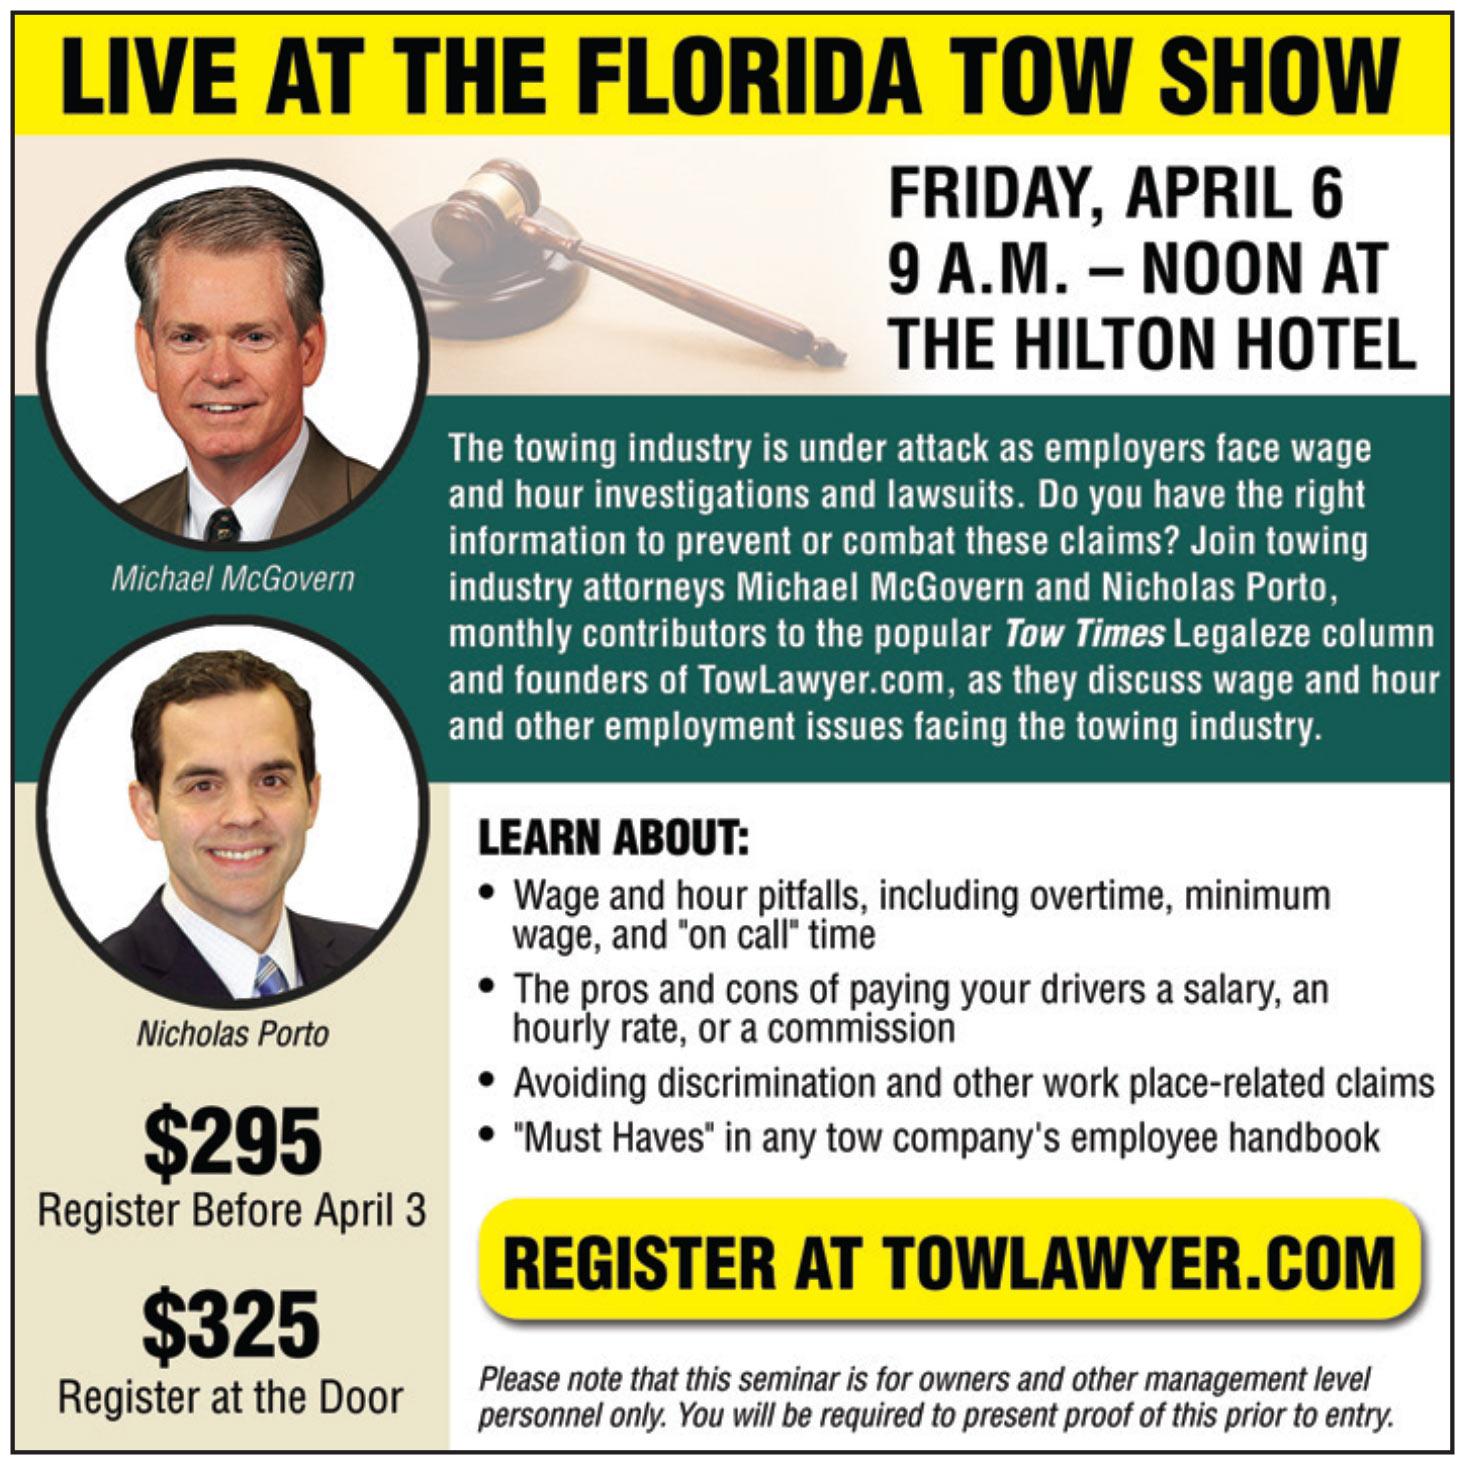 Florida Tow Show 2018